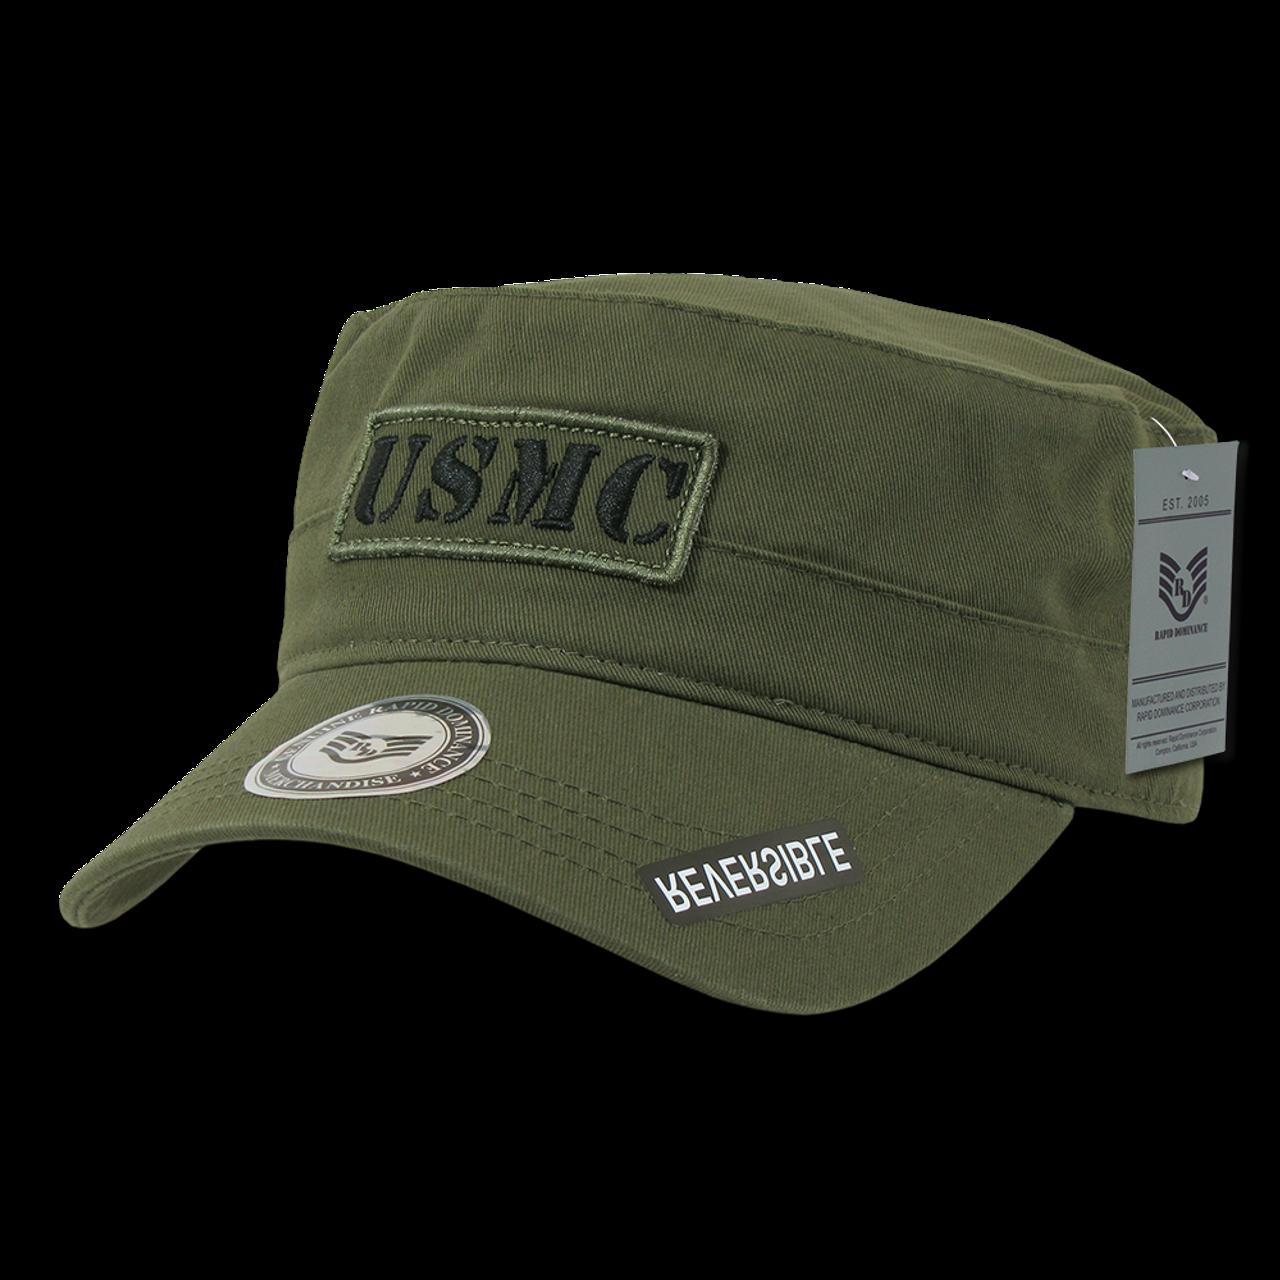 01e4189d77b S88 - Marines USMC Cap Vintage Military Style Reversible Olive Drab -  USMILITARYHATS.COM